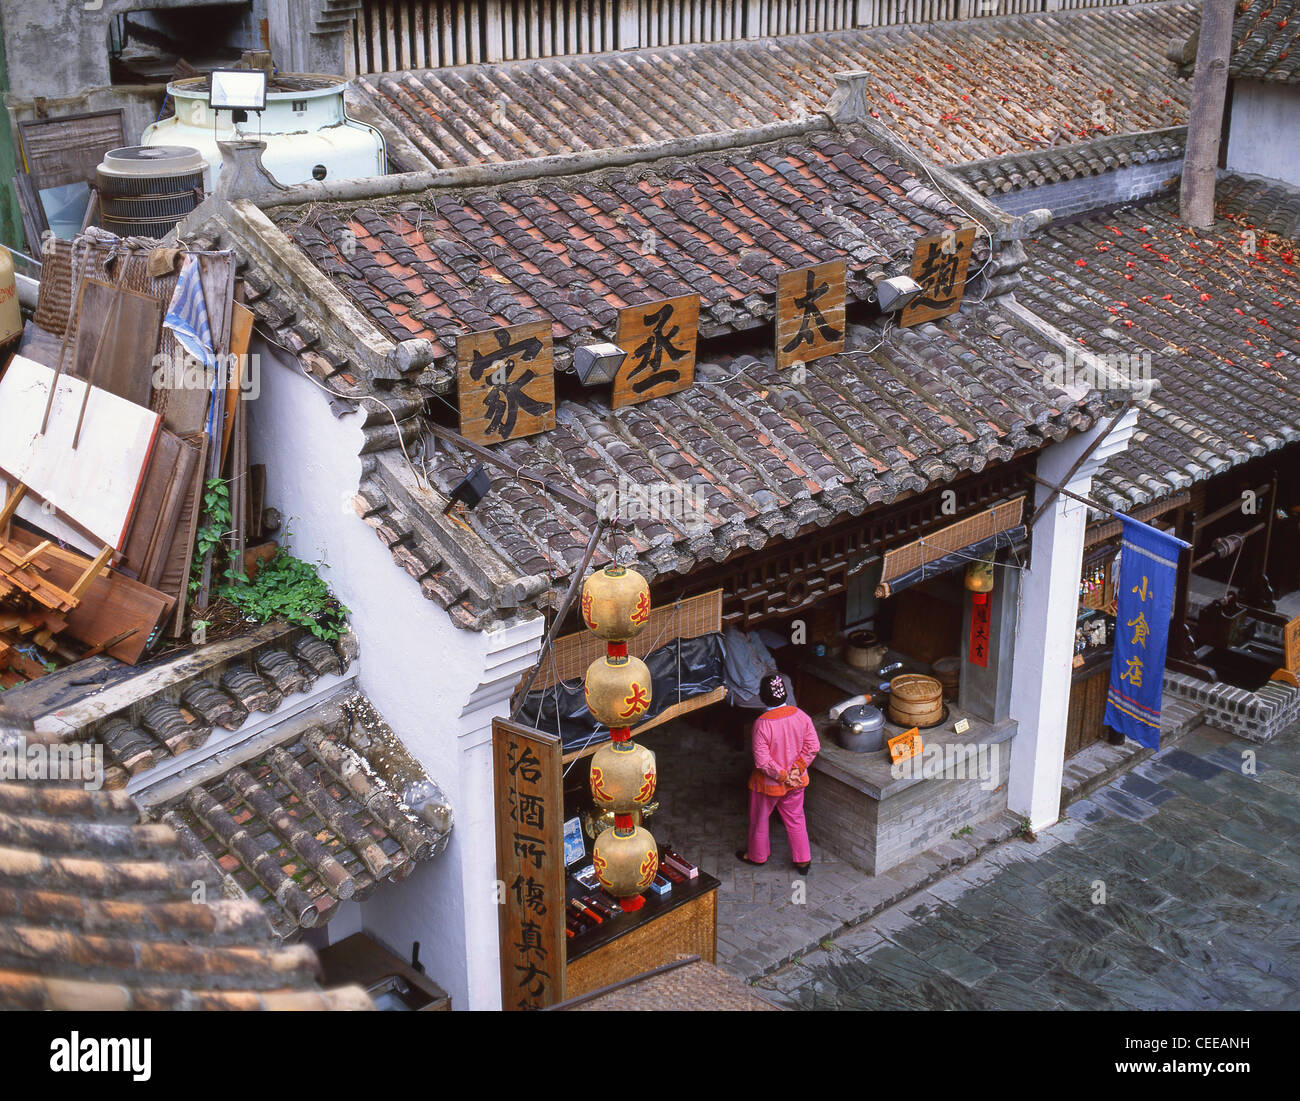 Sung Dynasty Village, Kowloon, Hong Kong, People's Republic of China - Stock Image